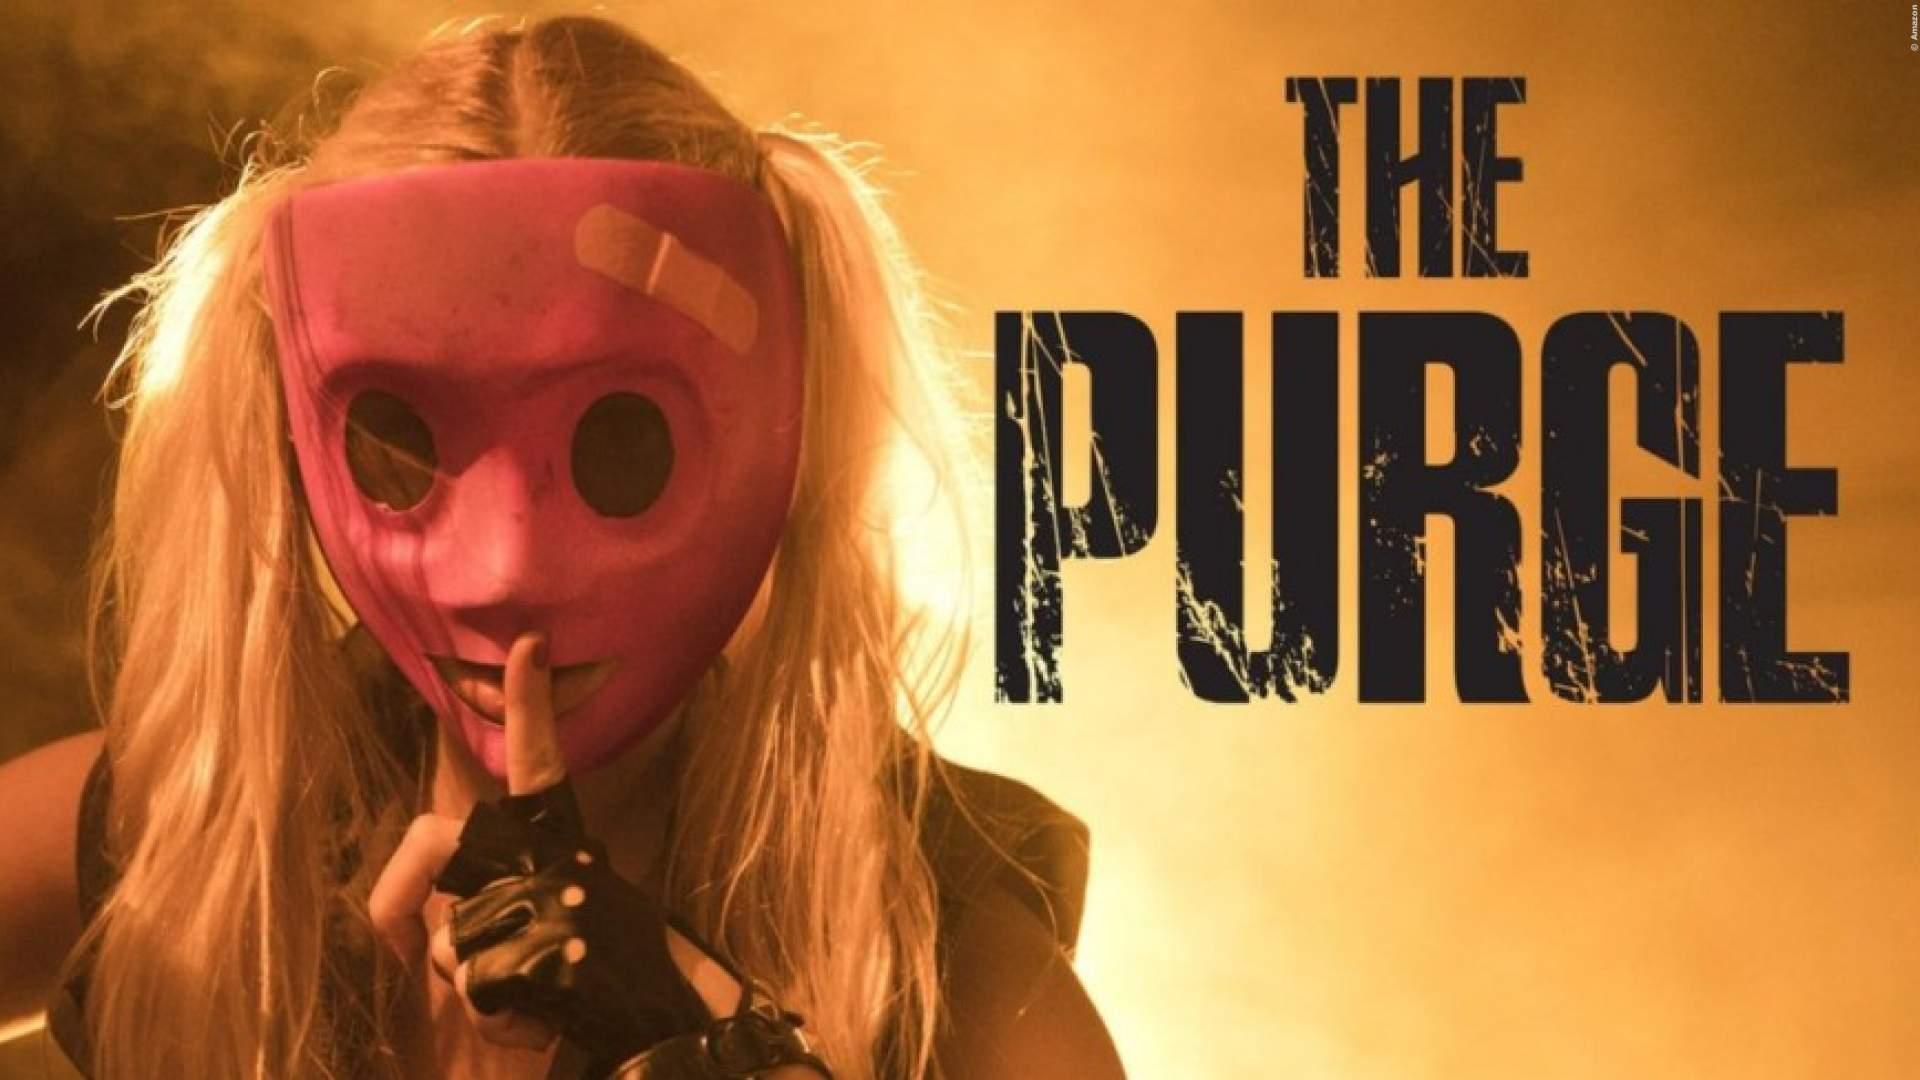 THE PURGE: So anders wird Staffel 2 - Erster Trailer verrät neue Figuren